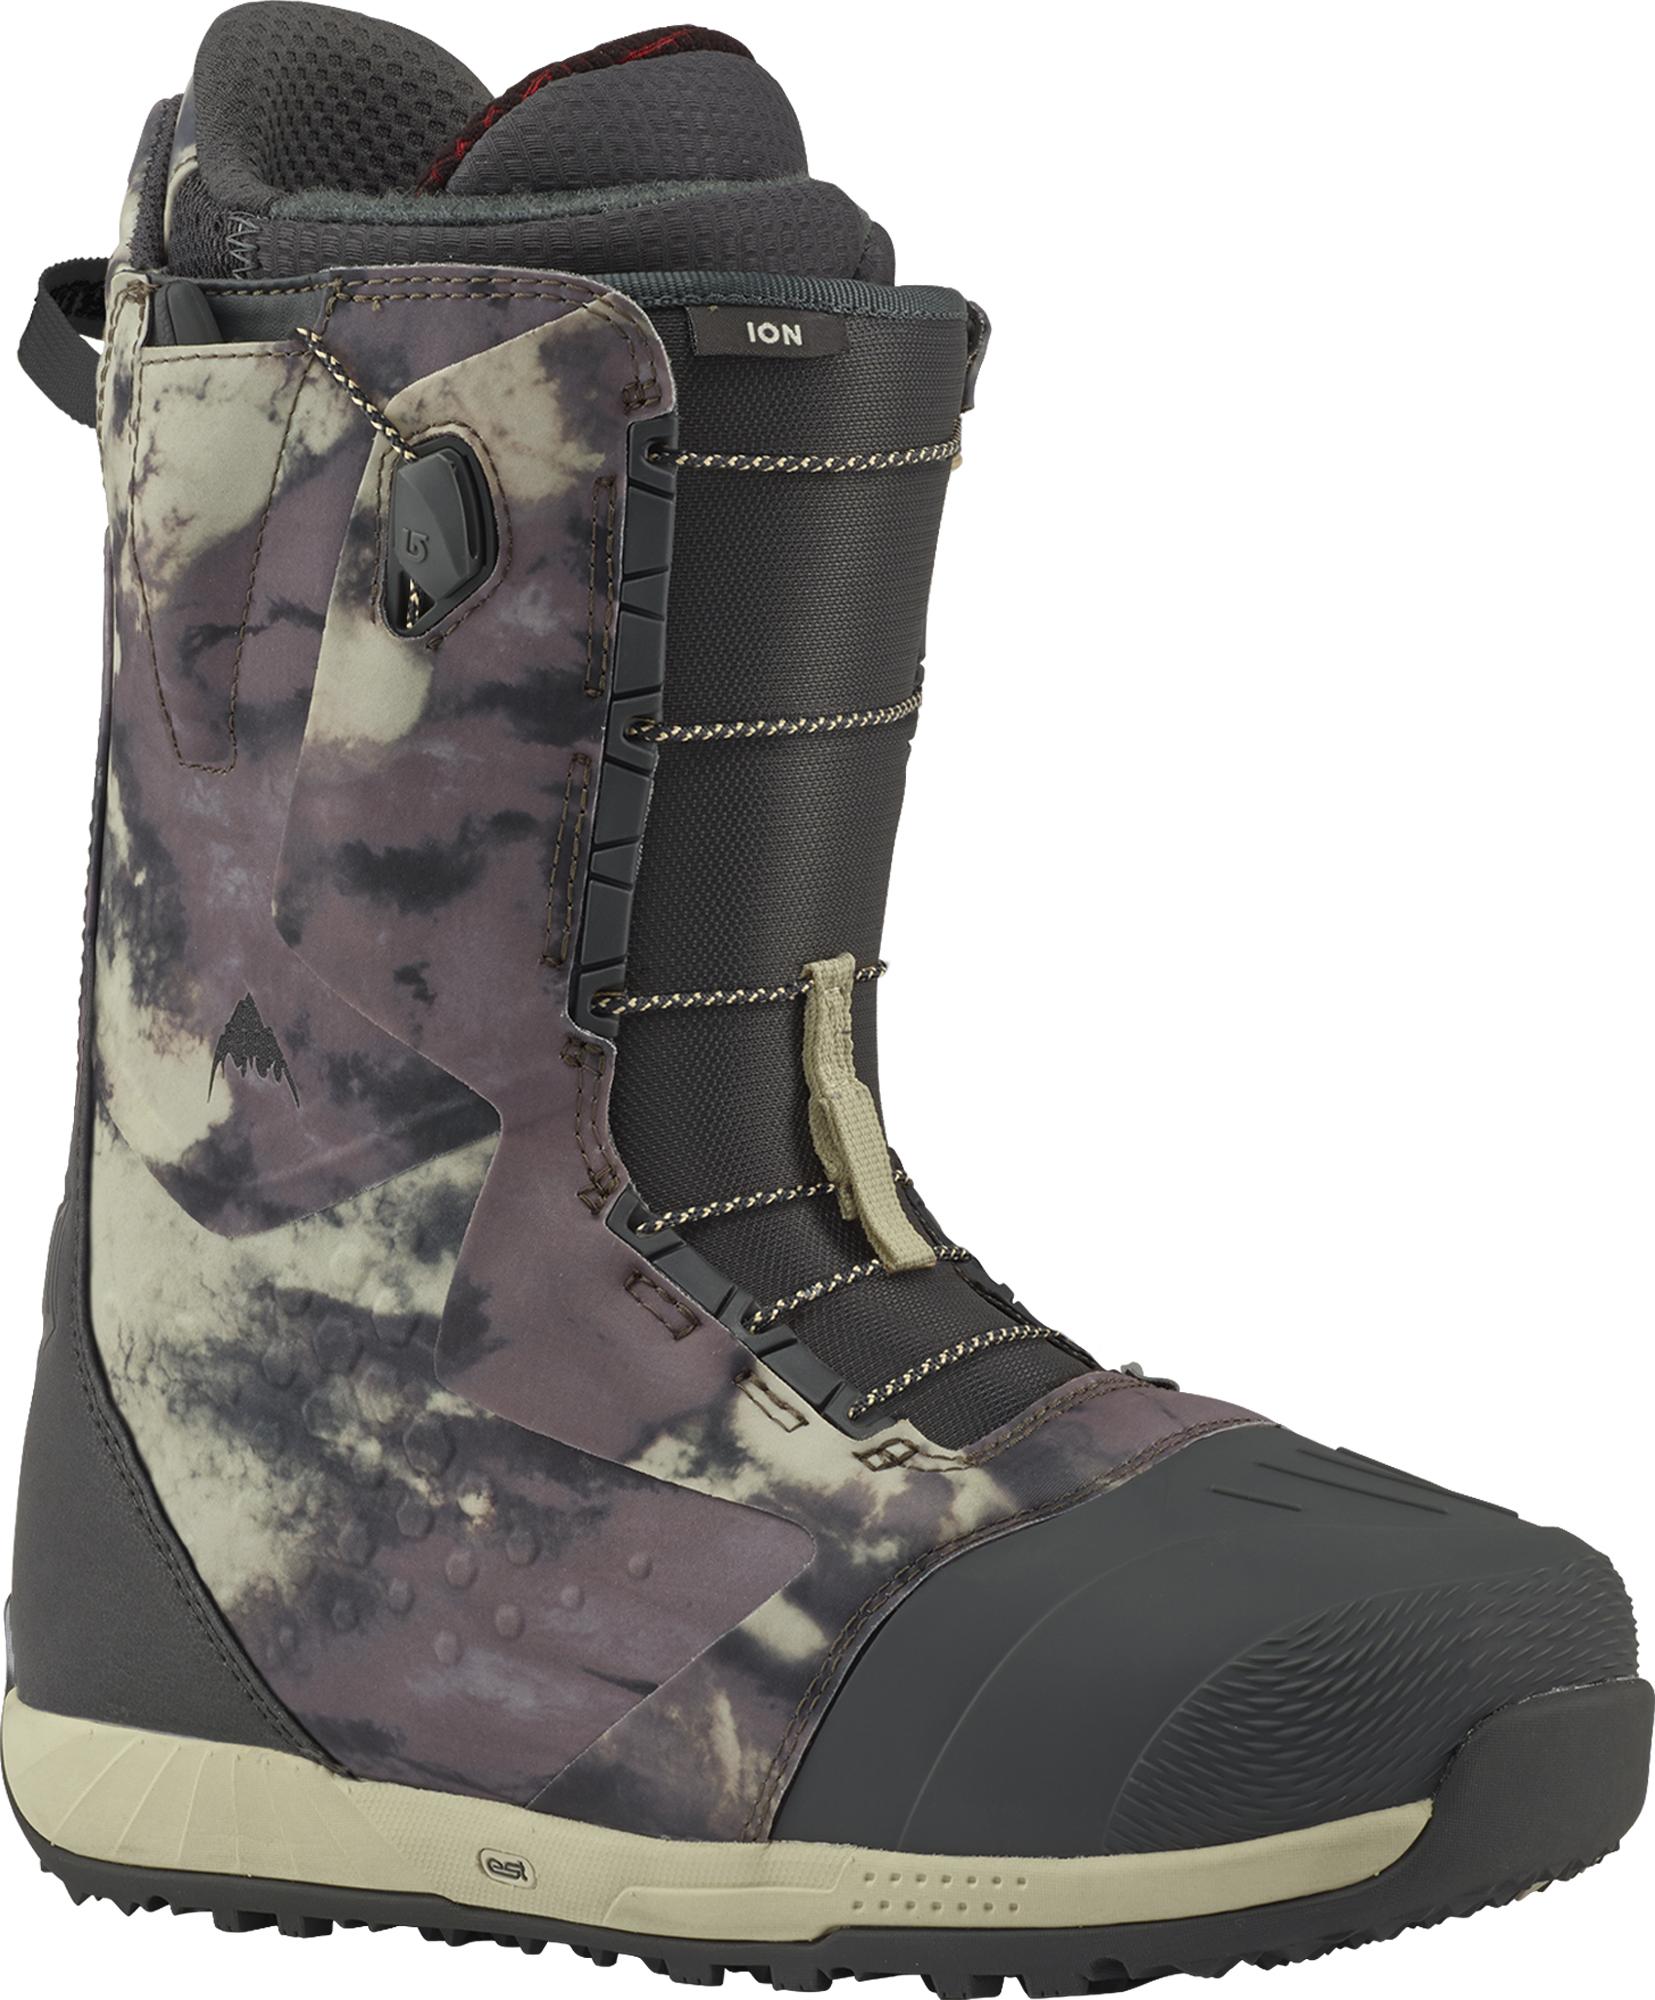 Burton Сноубордические ботинки Burton Ion, размер 44 цены онлайн